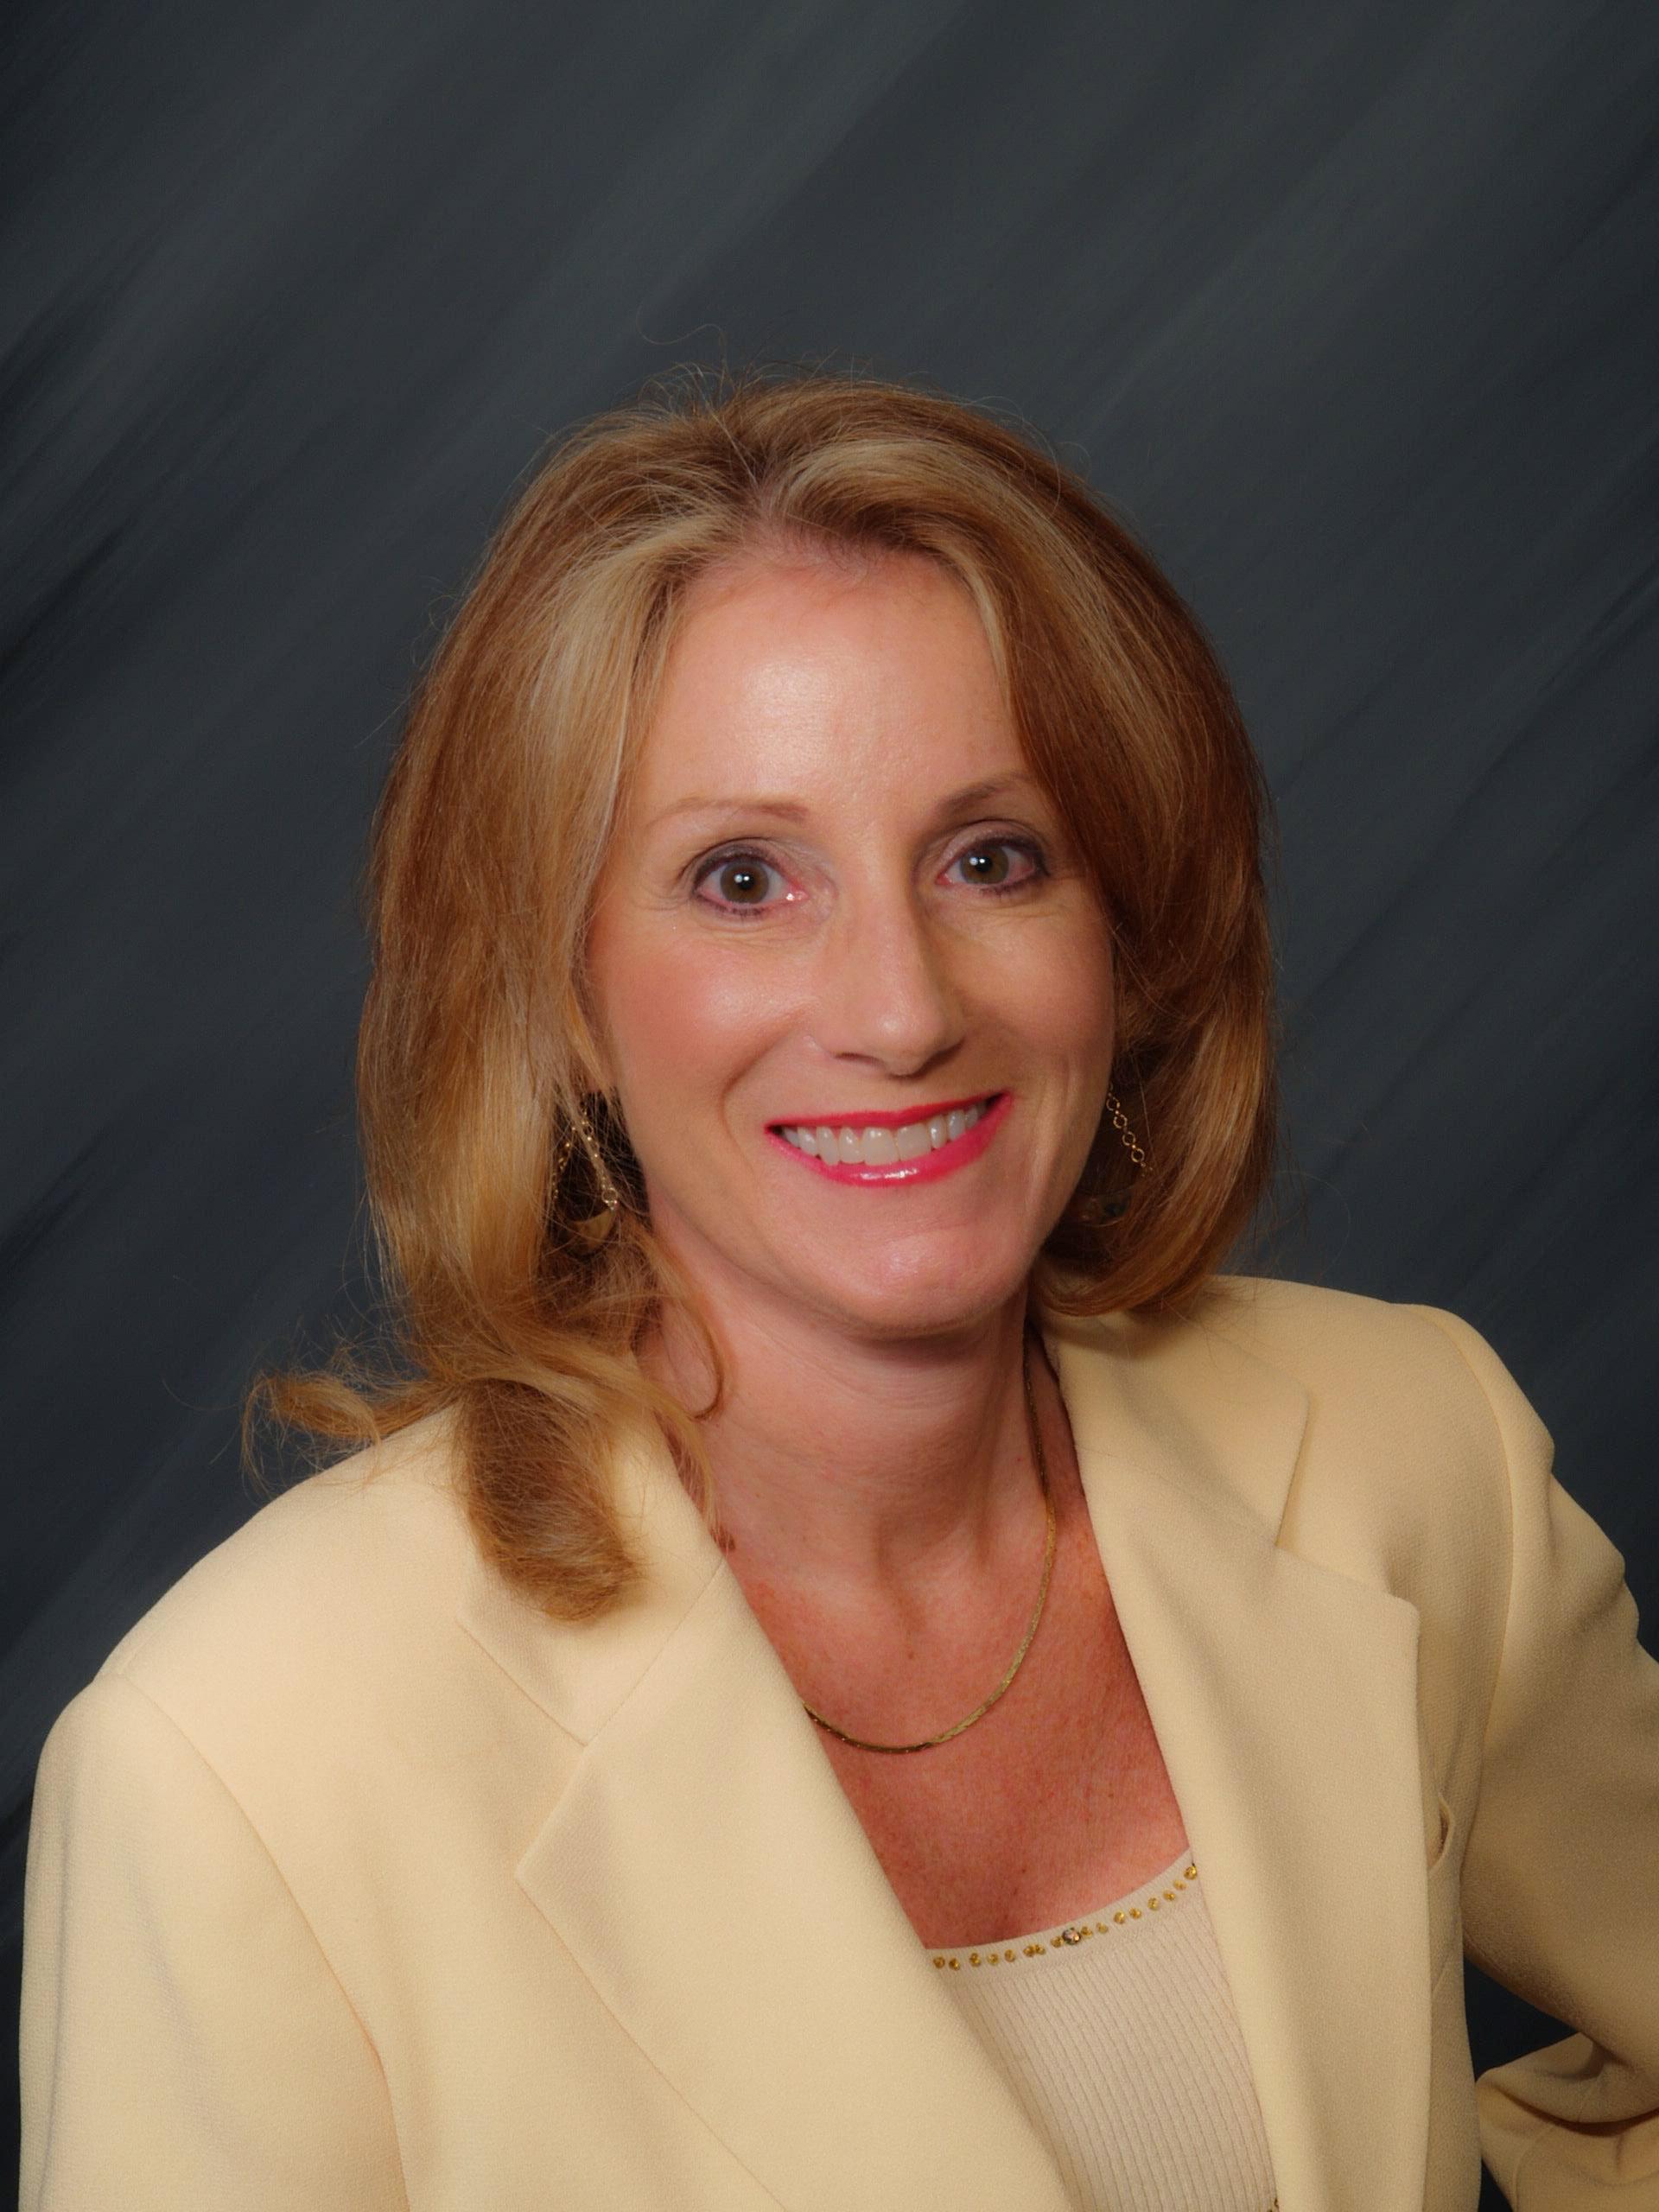 Maryanne Conlin